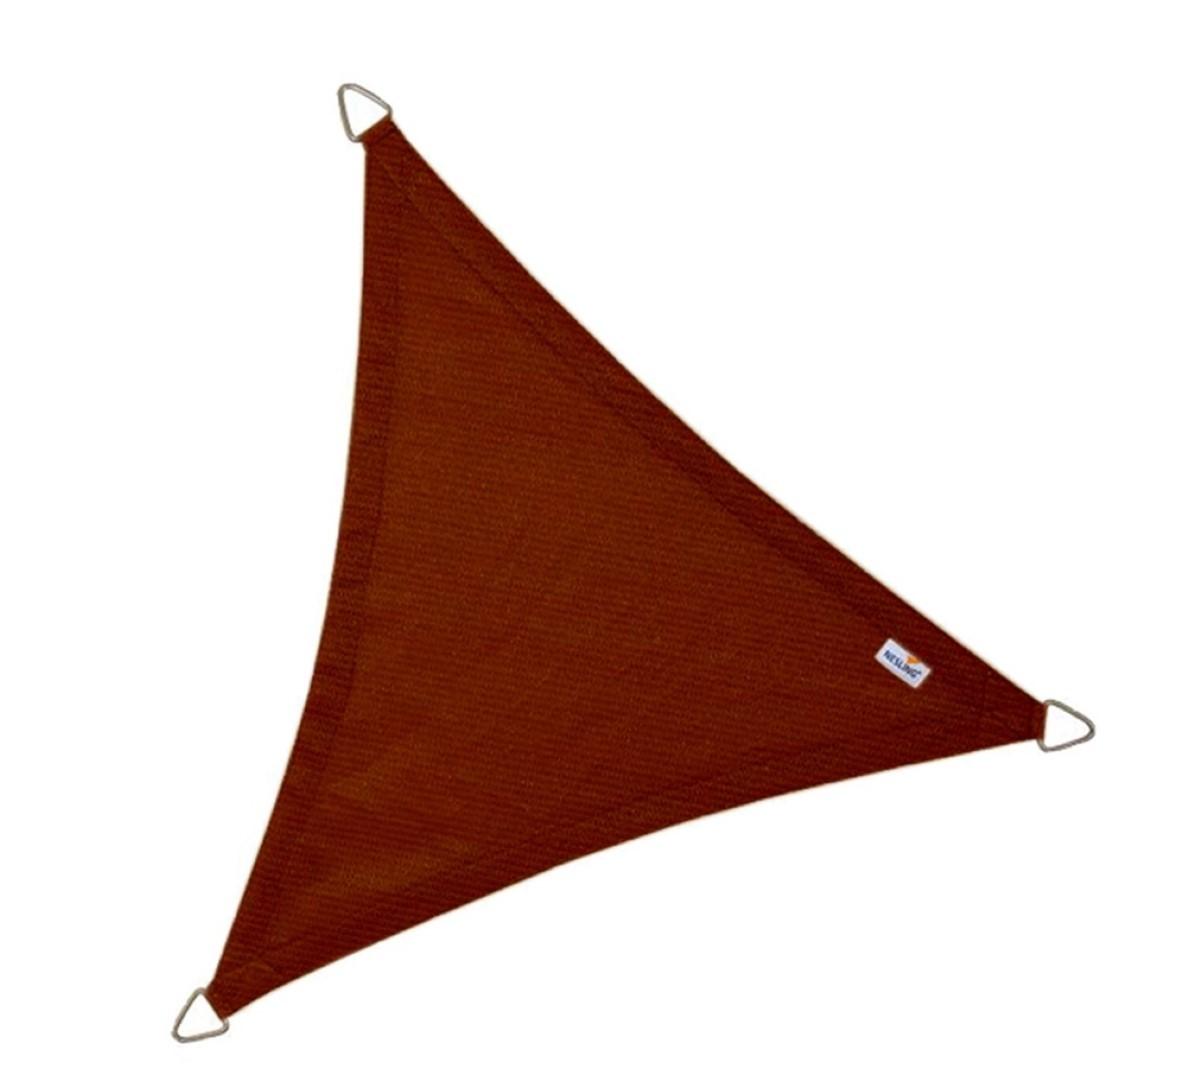 Driehoek 5,0 x 5,0 x 5,0m, Terracotta